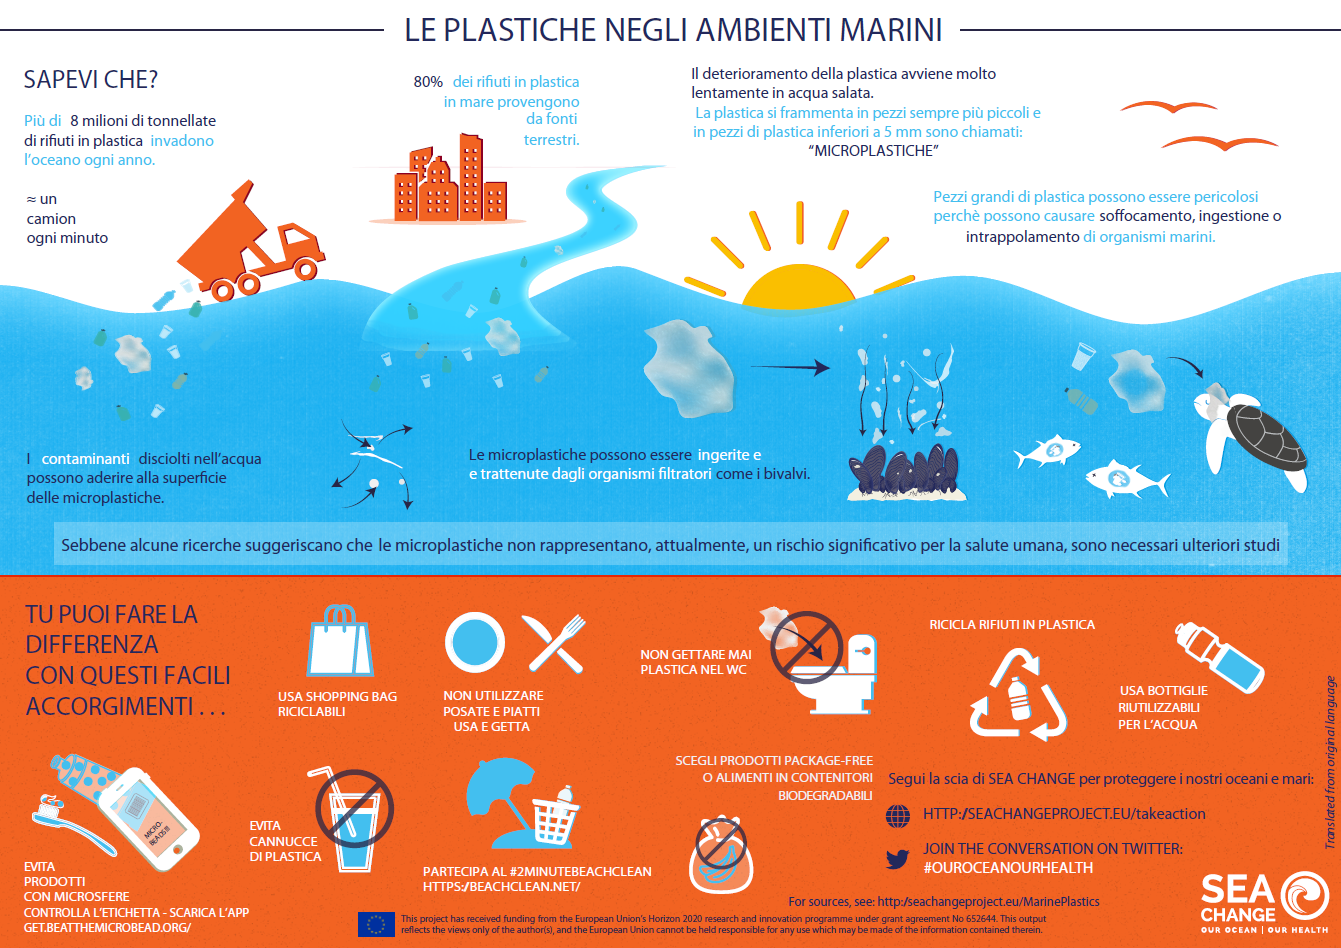 Plastica nell'Oceano